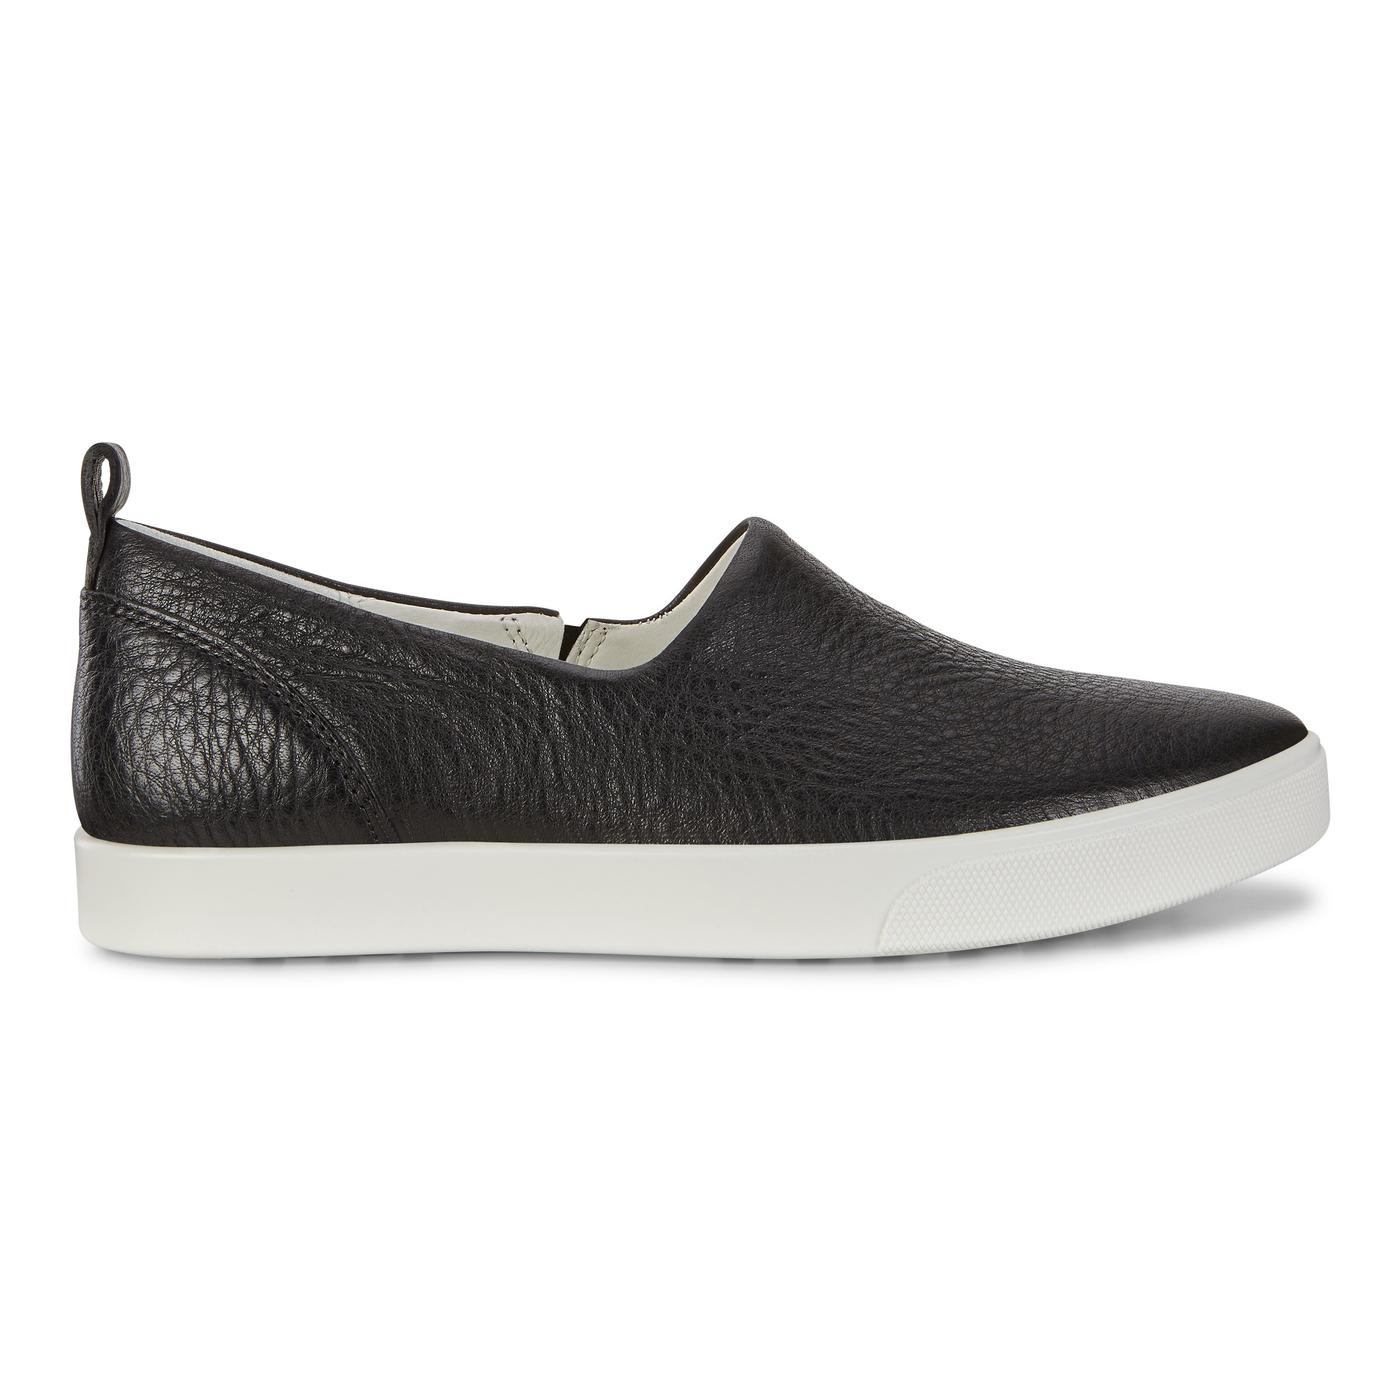 a463ea01 ECCO Women's Gillian Slip On | Casual Shoes | ECCO® Shoes